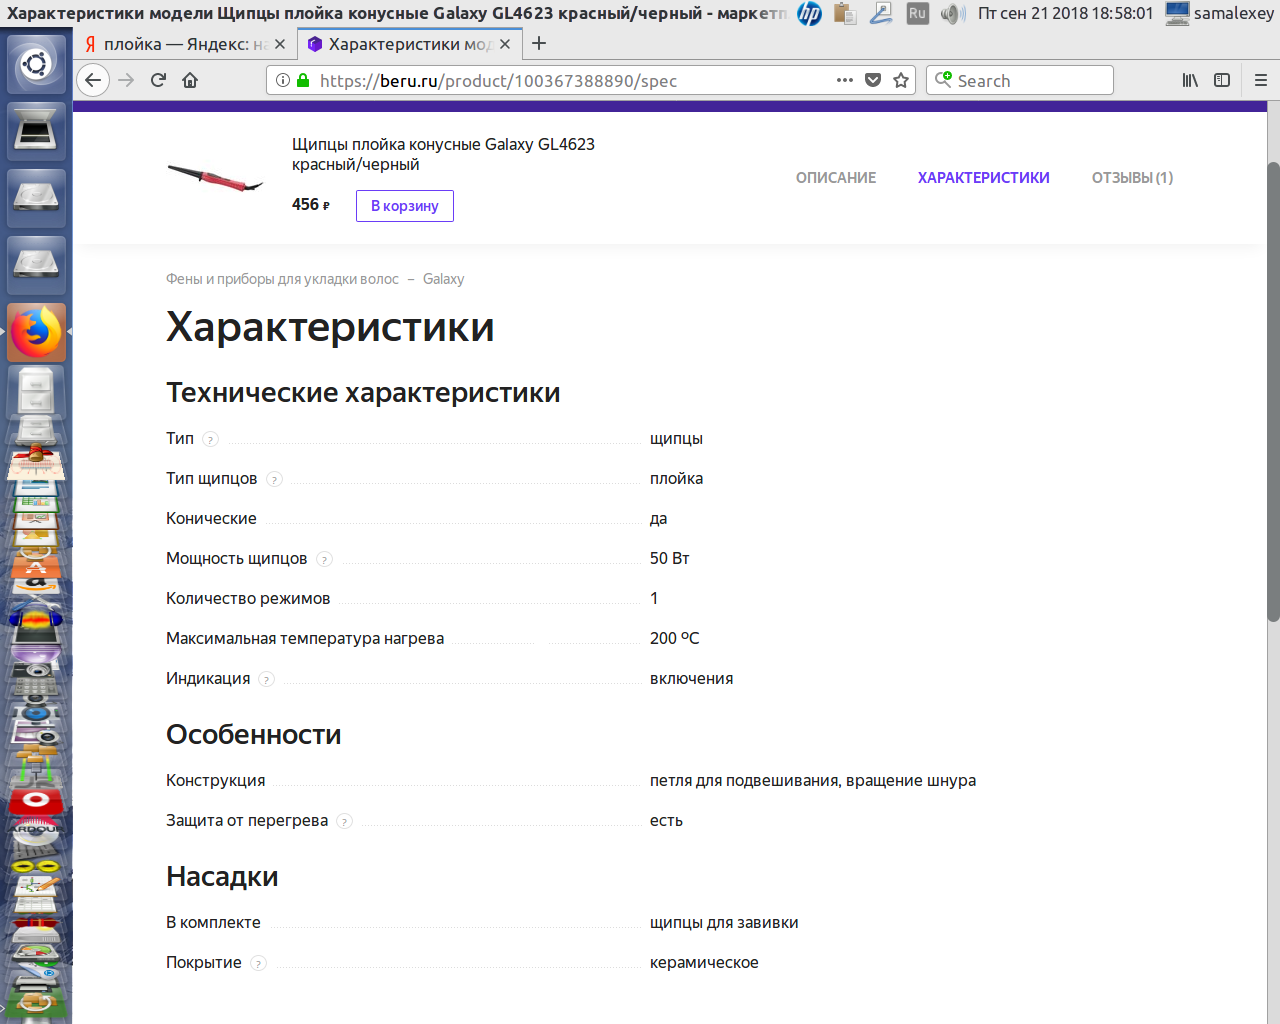 https://i1.imageban.ru/out/2018/09/21/48eaf1f9f5536ebf0936de86e242cf3b.png